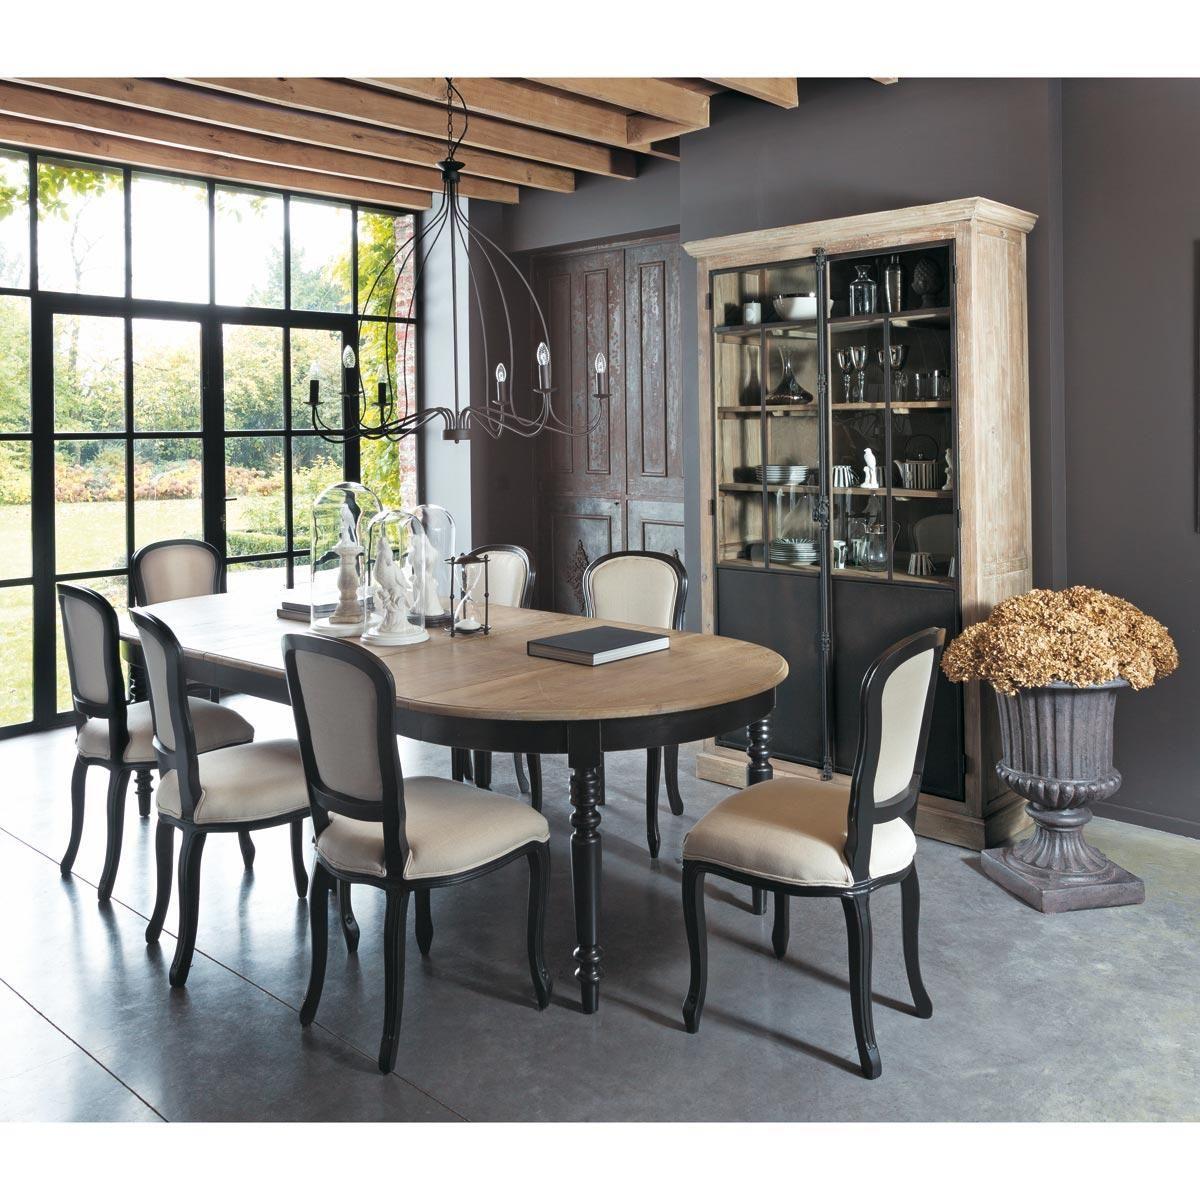 Chaise Salle A Manger Maison Du Monde | Beautiful Chaise Margaux ...